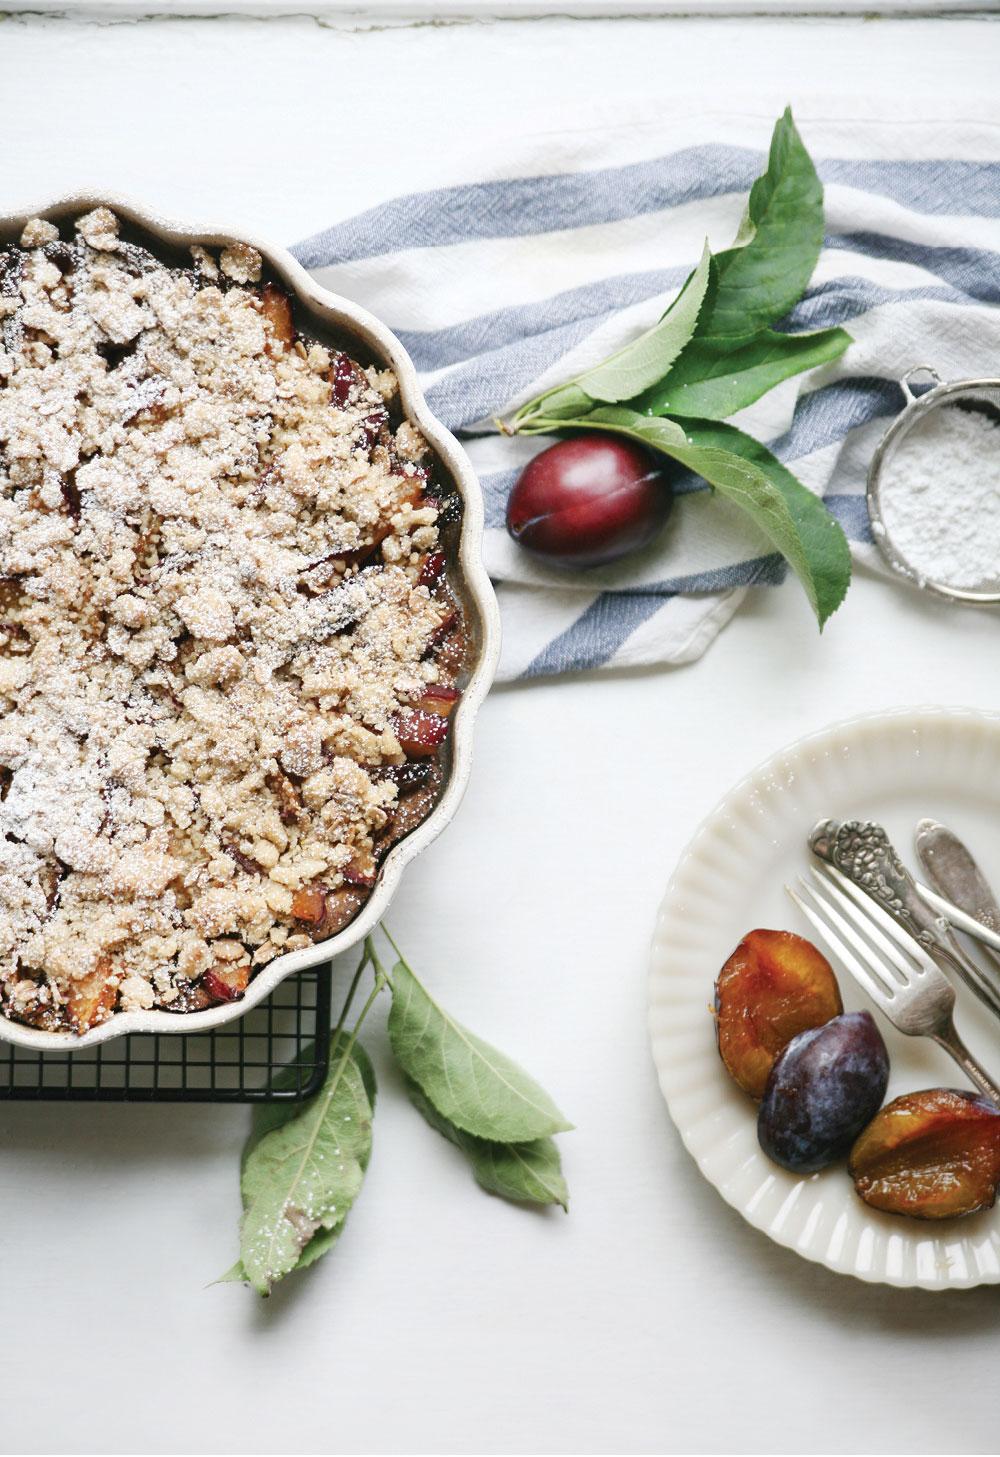 Gluten-Free-Crumble-Plum-Pie-Pure-Ella-Leche5